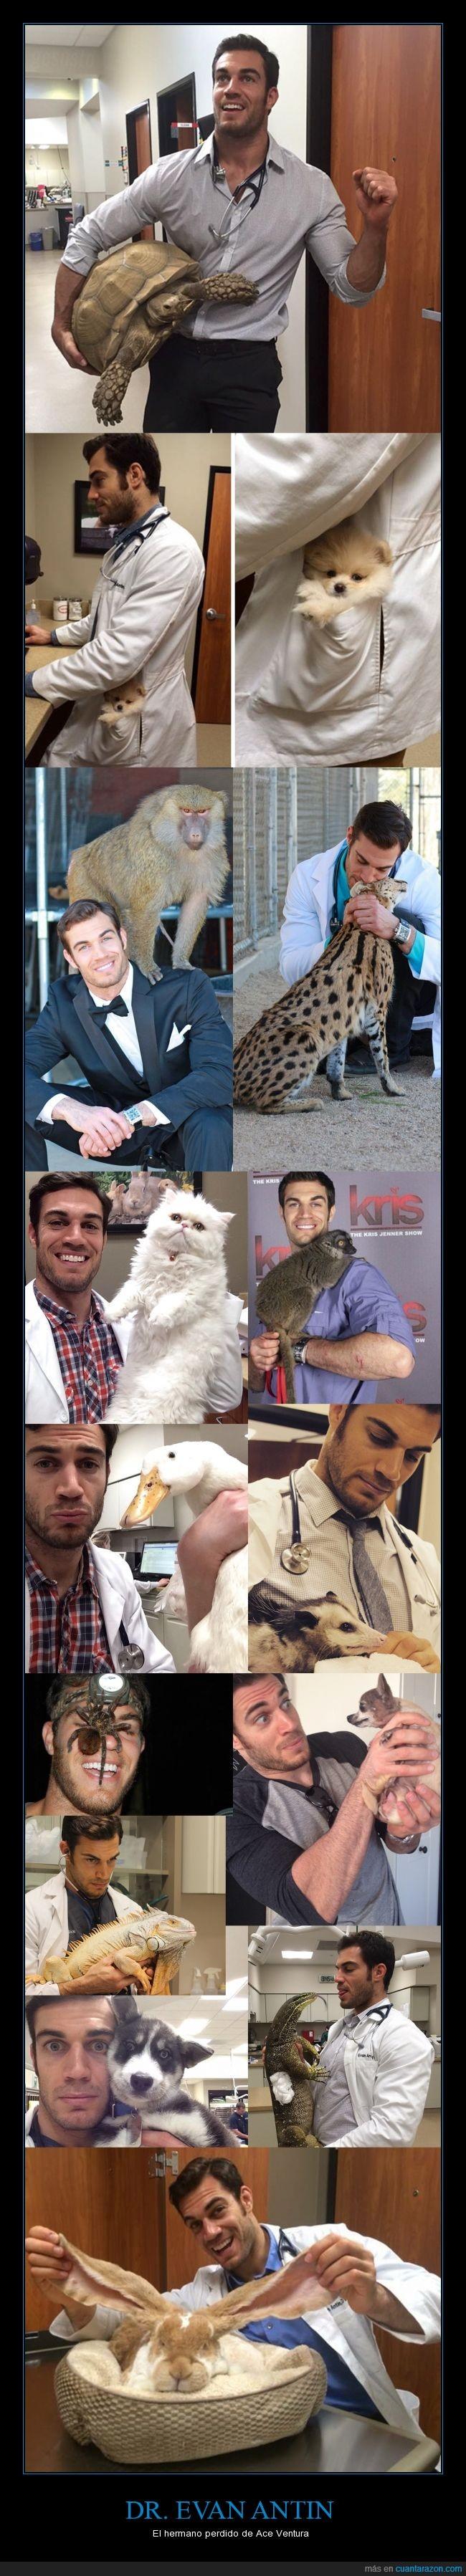 Animales,conejo,doctor,Dr Evan Antin,gato,Instagram,mono,pato,perro,Veterinario